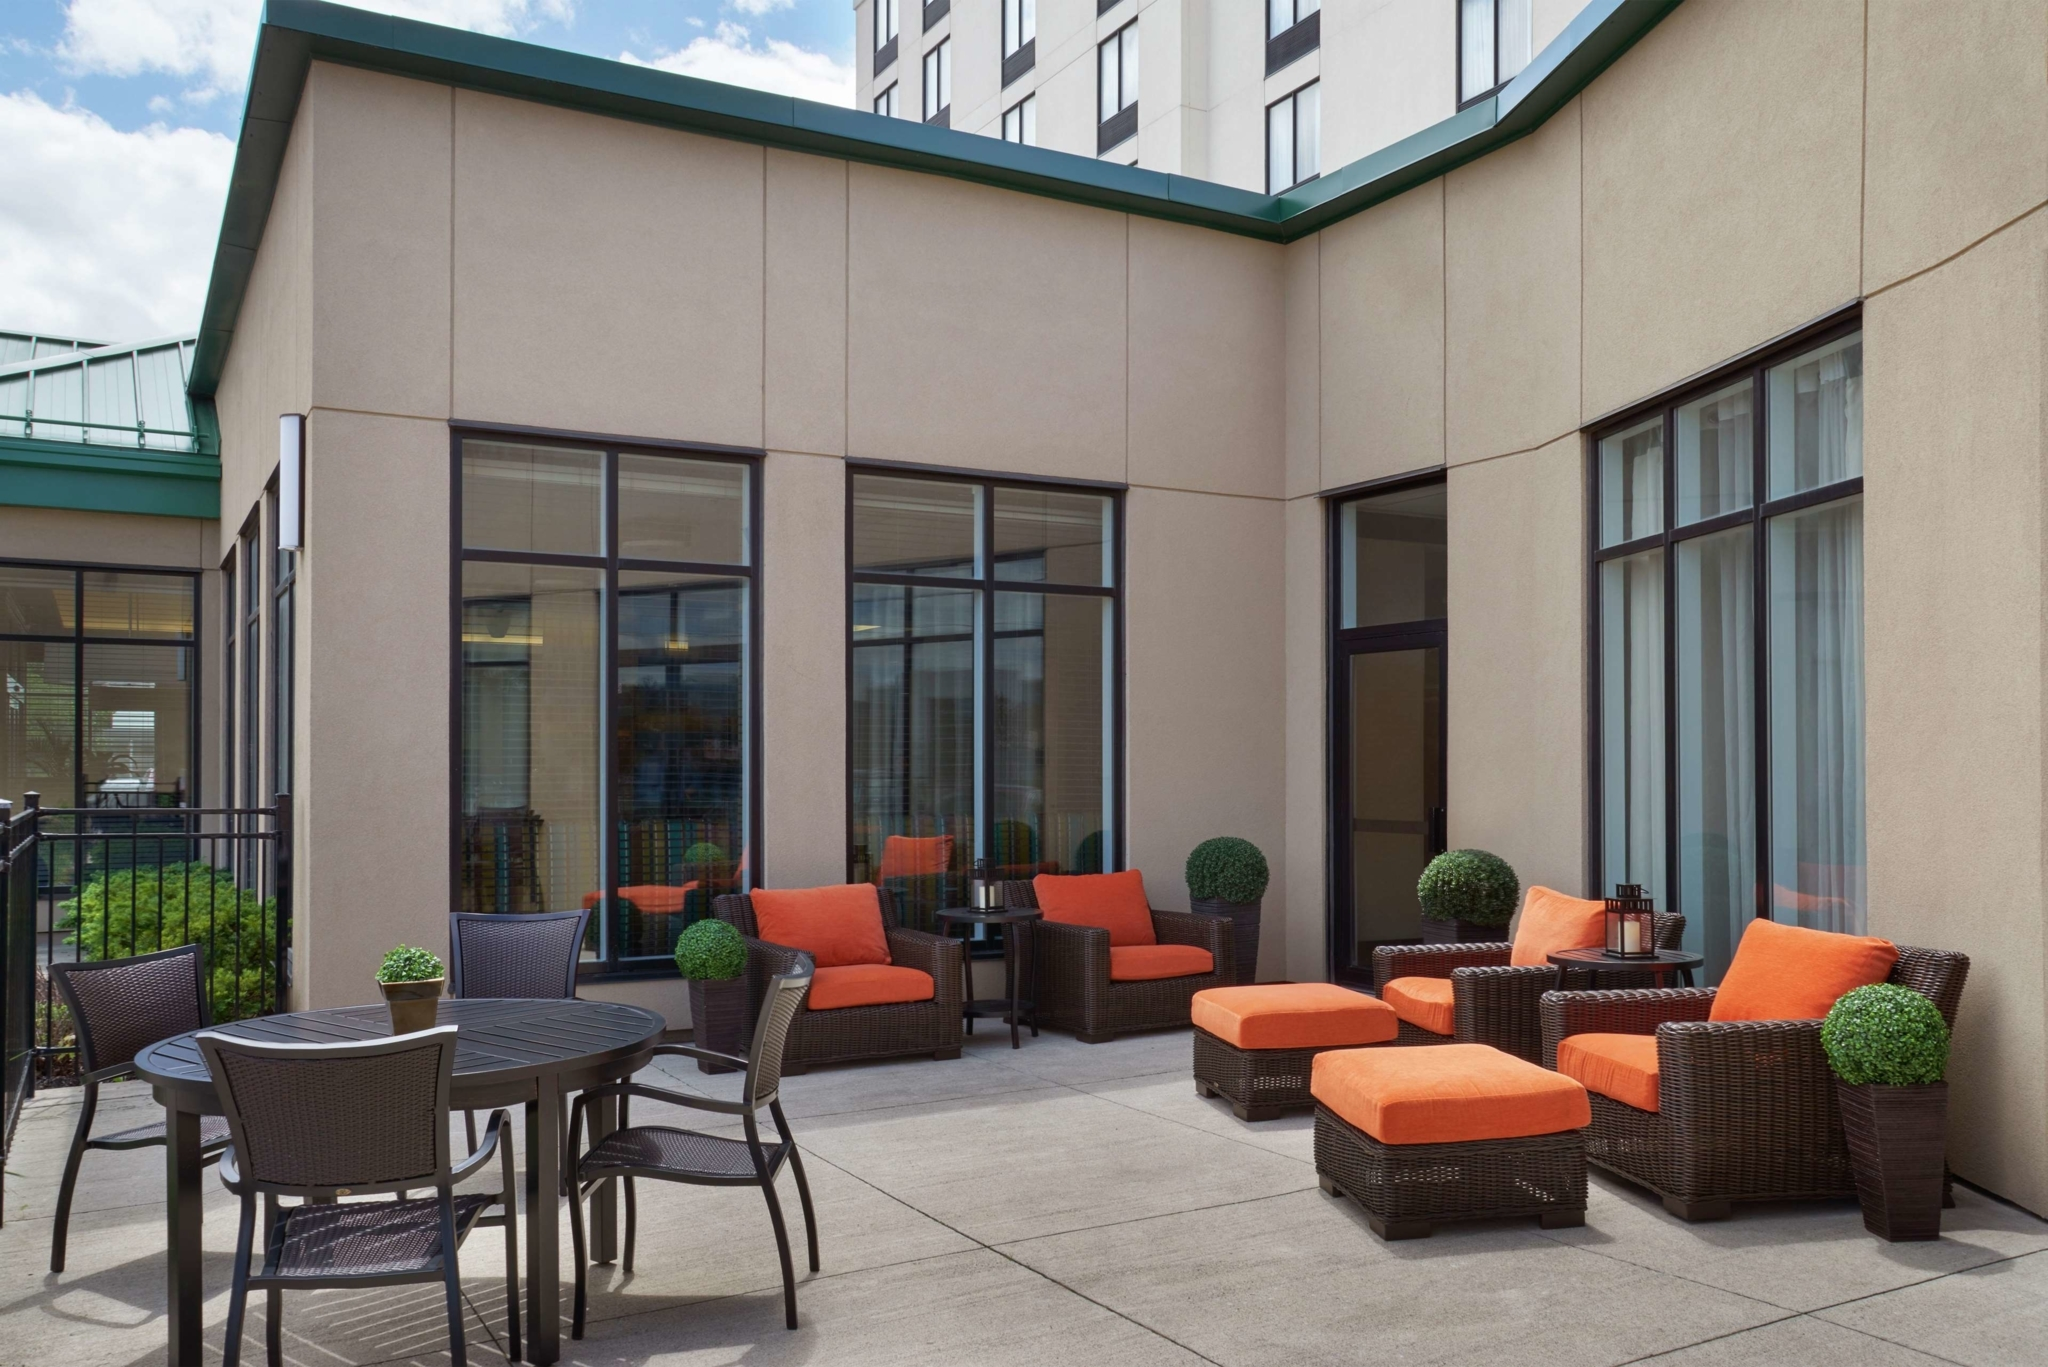 Hilton Garden Inn Toronto Airport West/Mississauga - Hotels